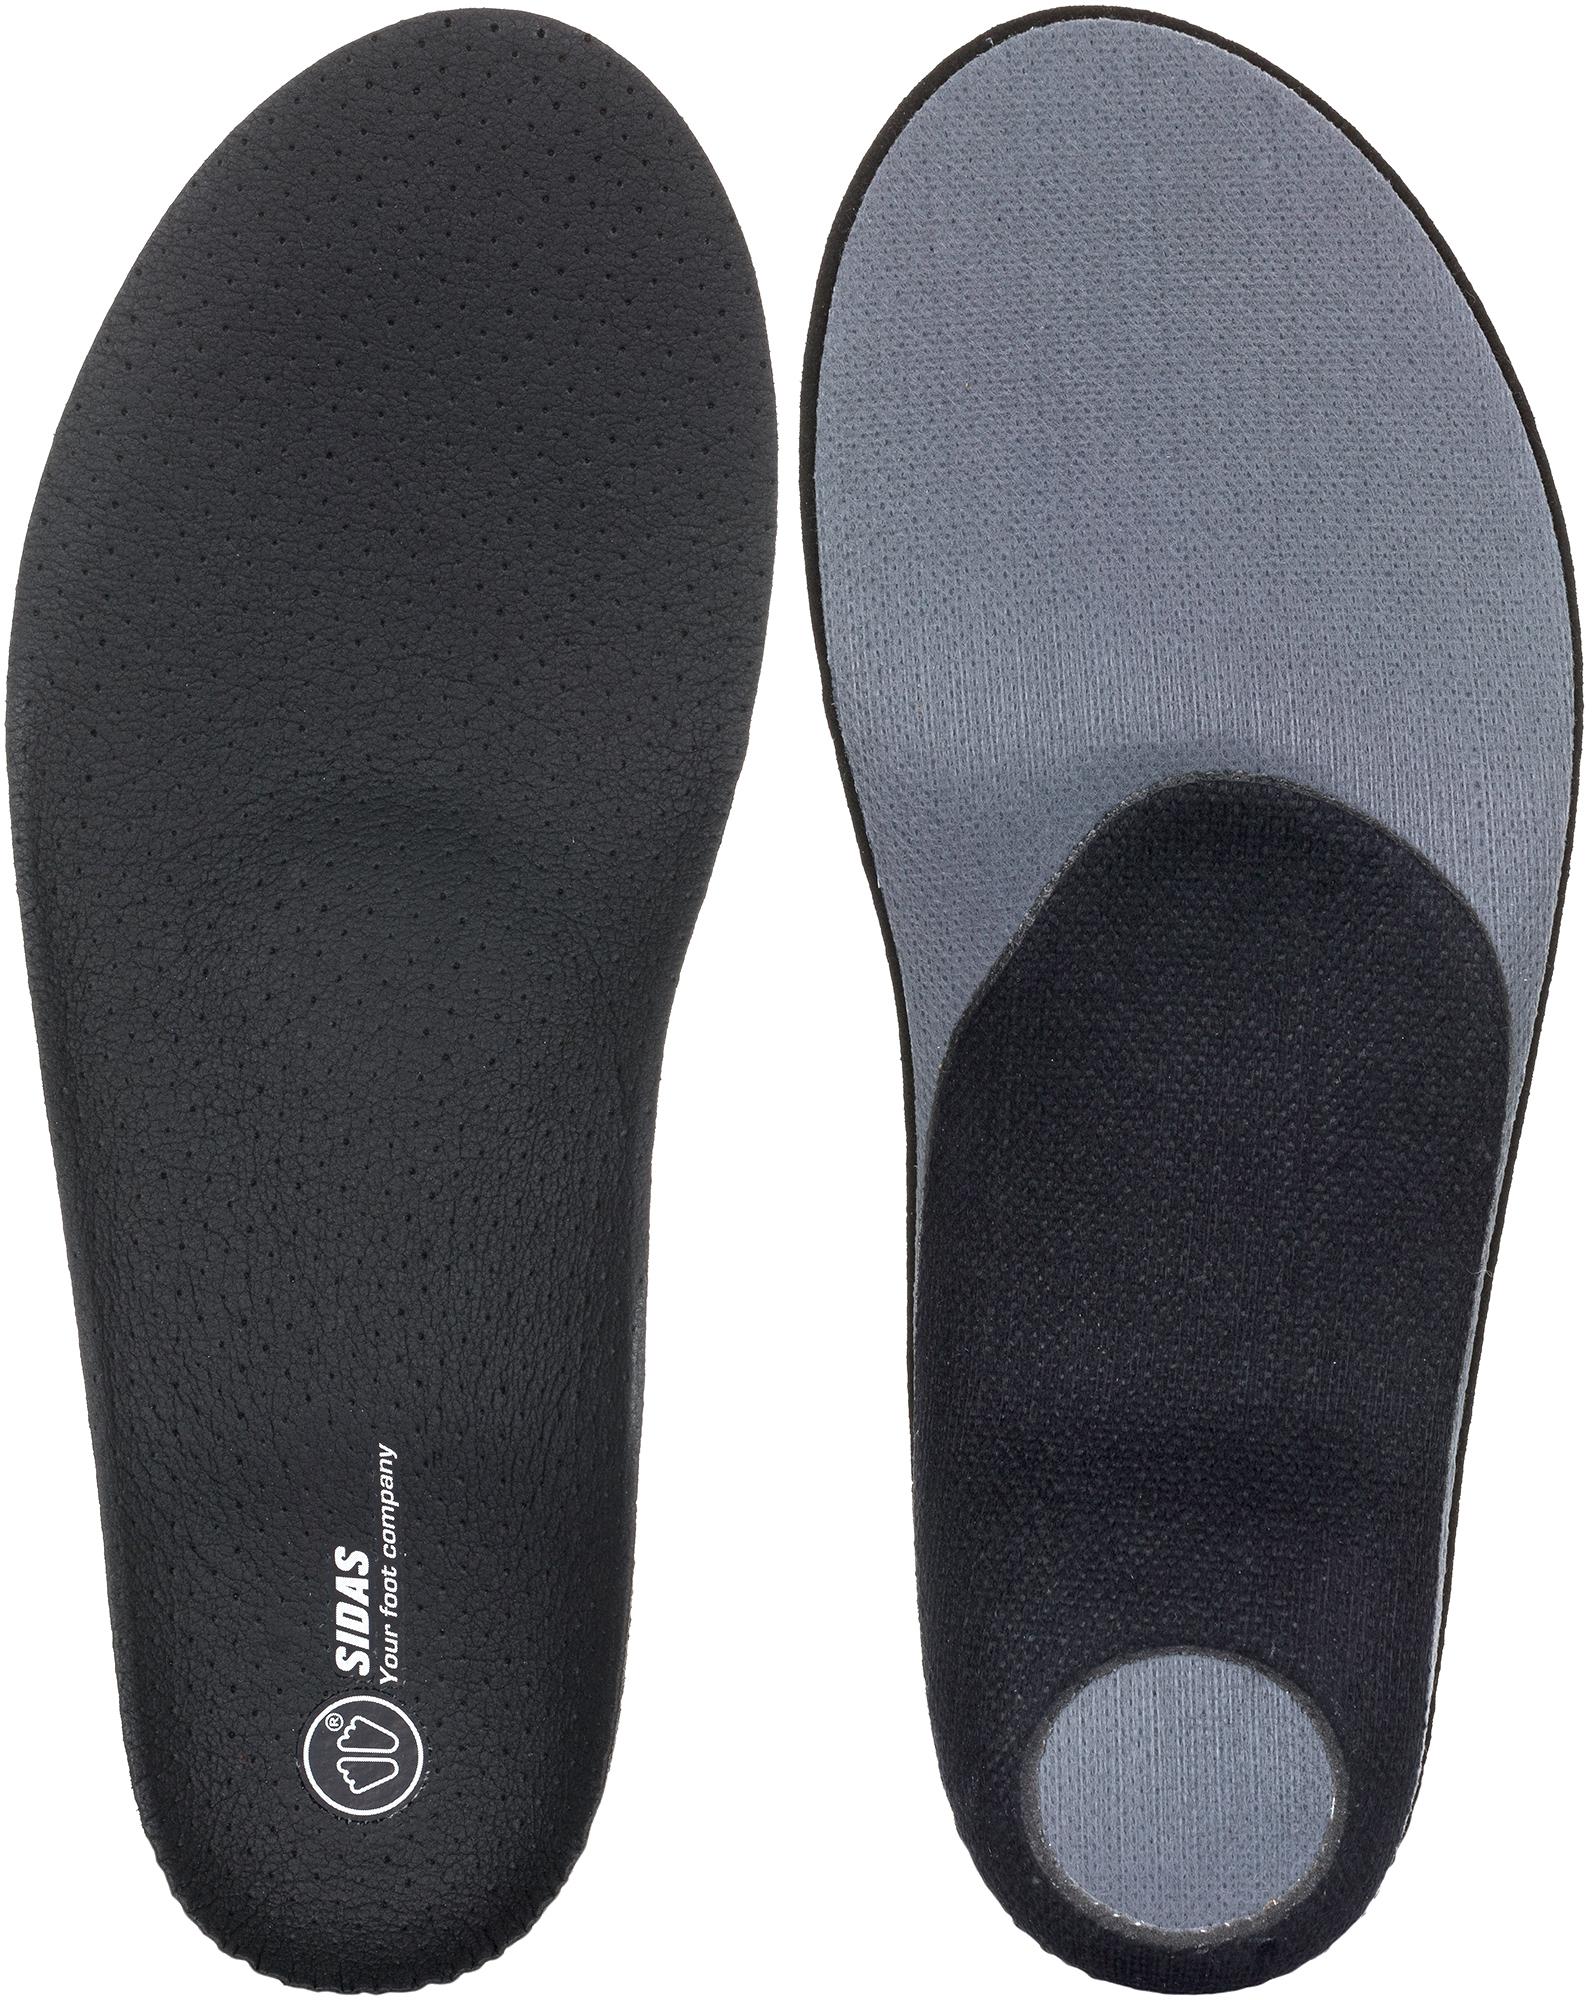 Sidas Стельки Sidas City+ Slim (для узкой обуви) , размер 39-41 цена